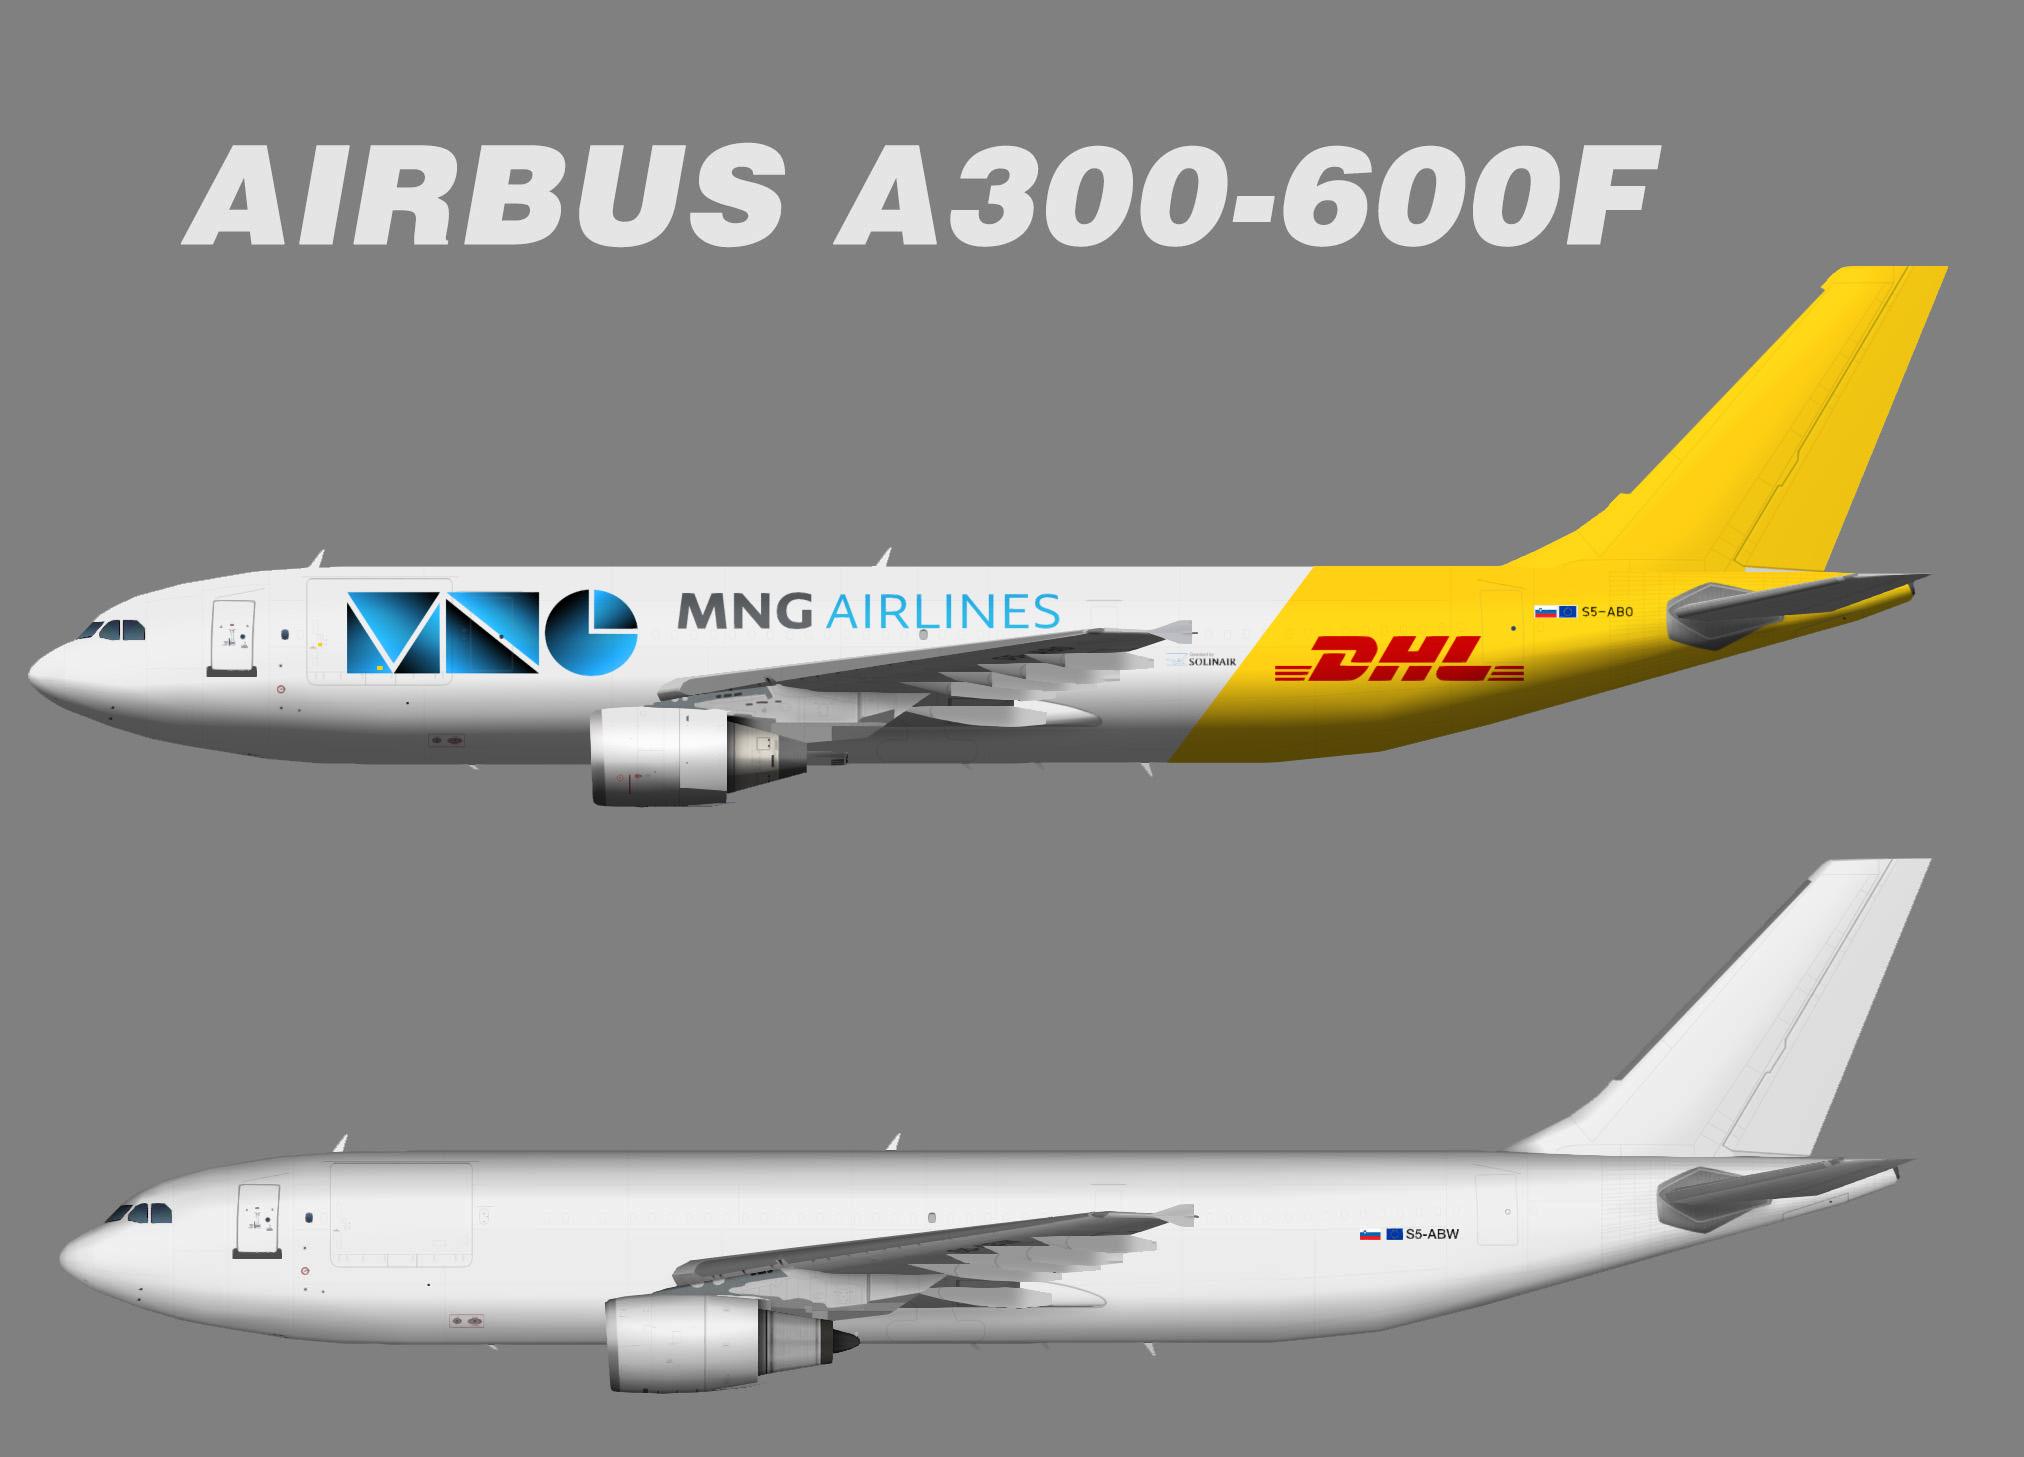 Solinair Airbus A300-600F